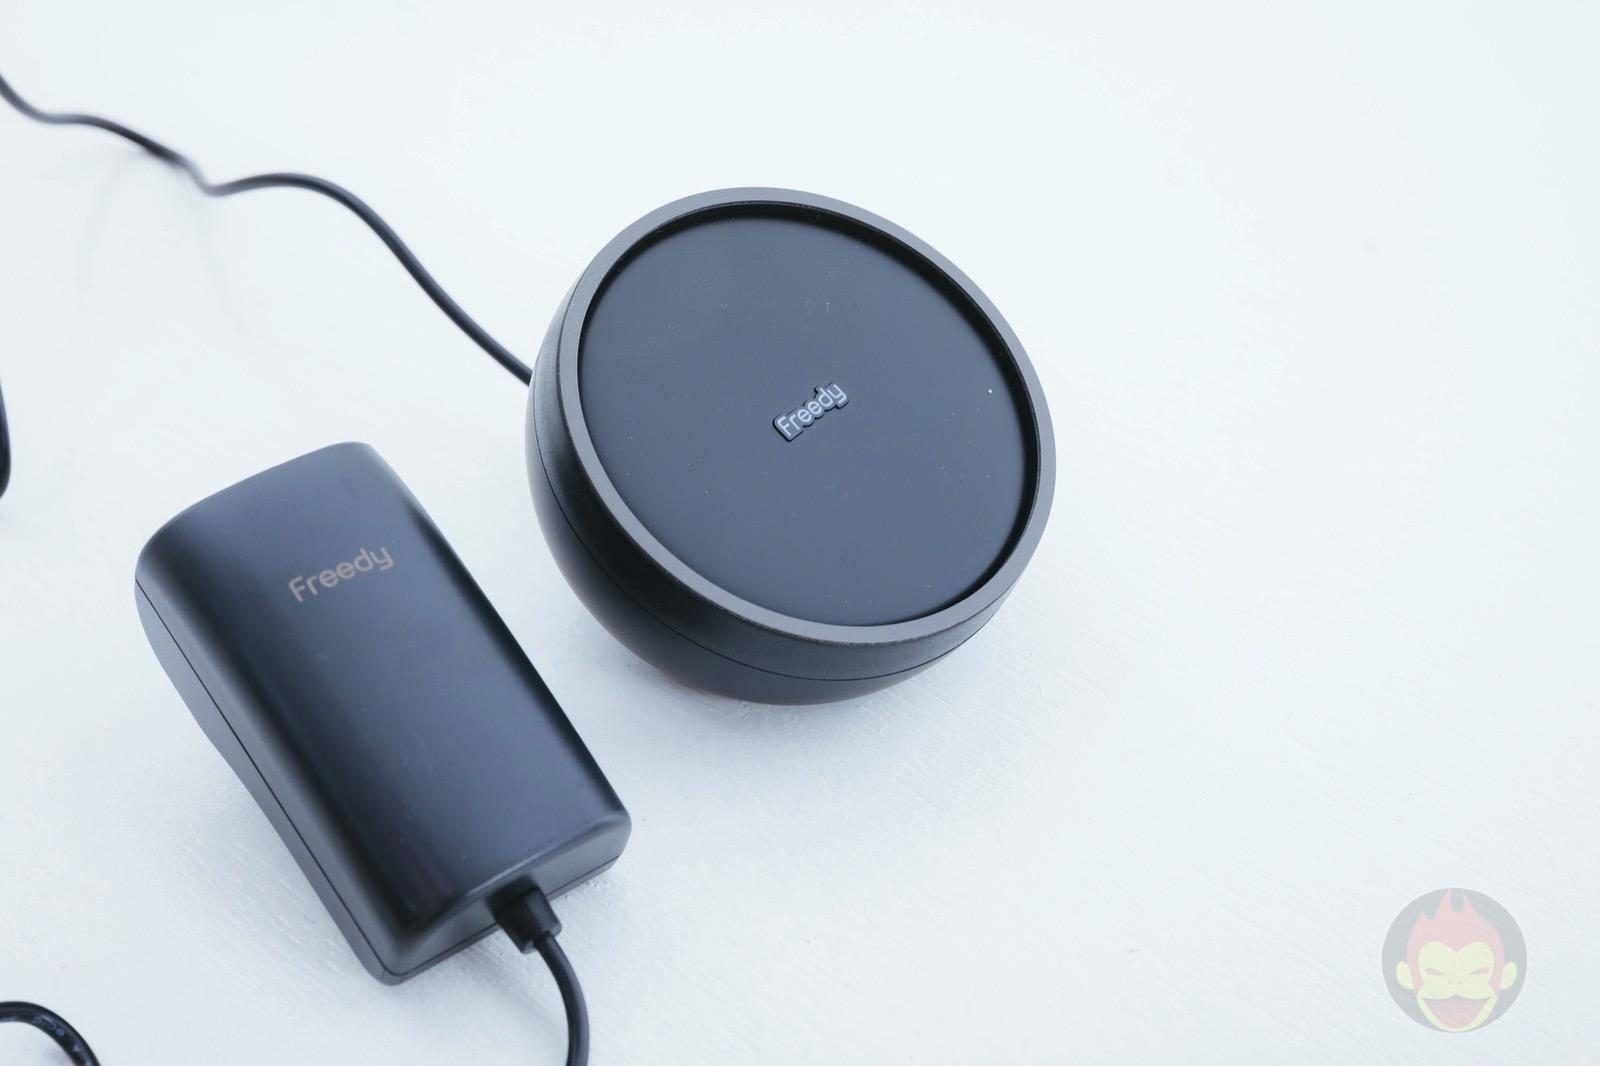 Freedy-Flex-EA1203-Wireless-Charger-Review-01.jpg